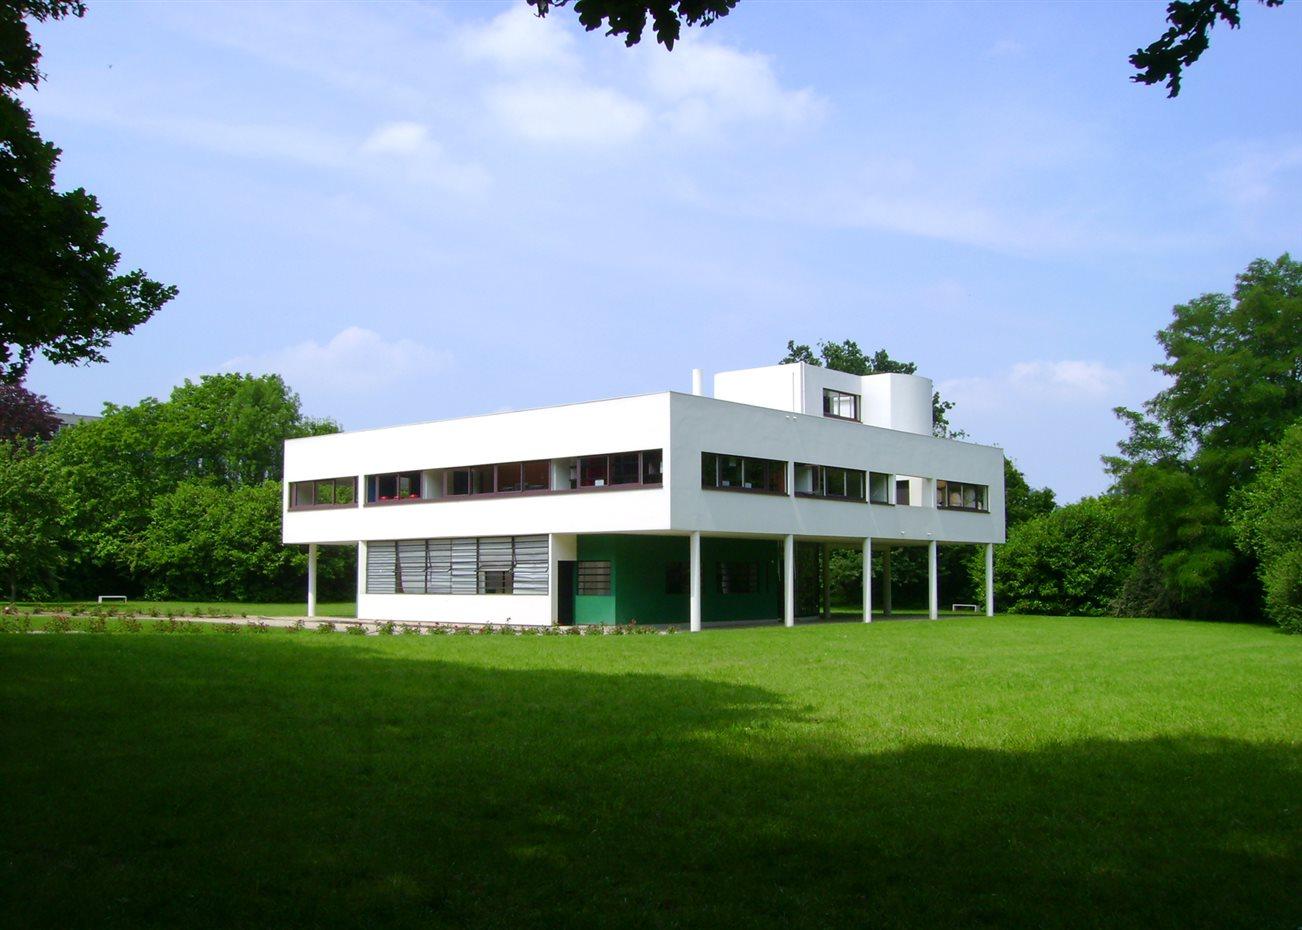 Ville Savoye, de Le Corbusier